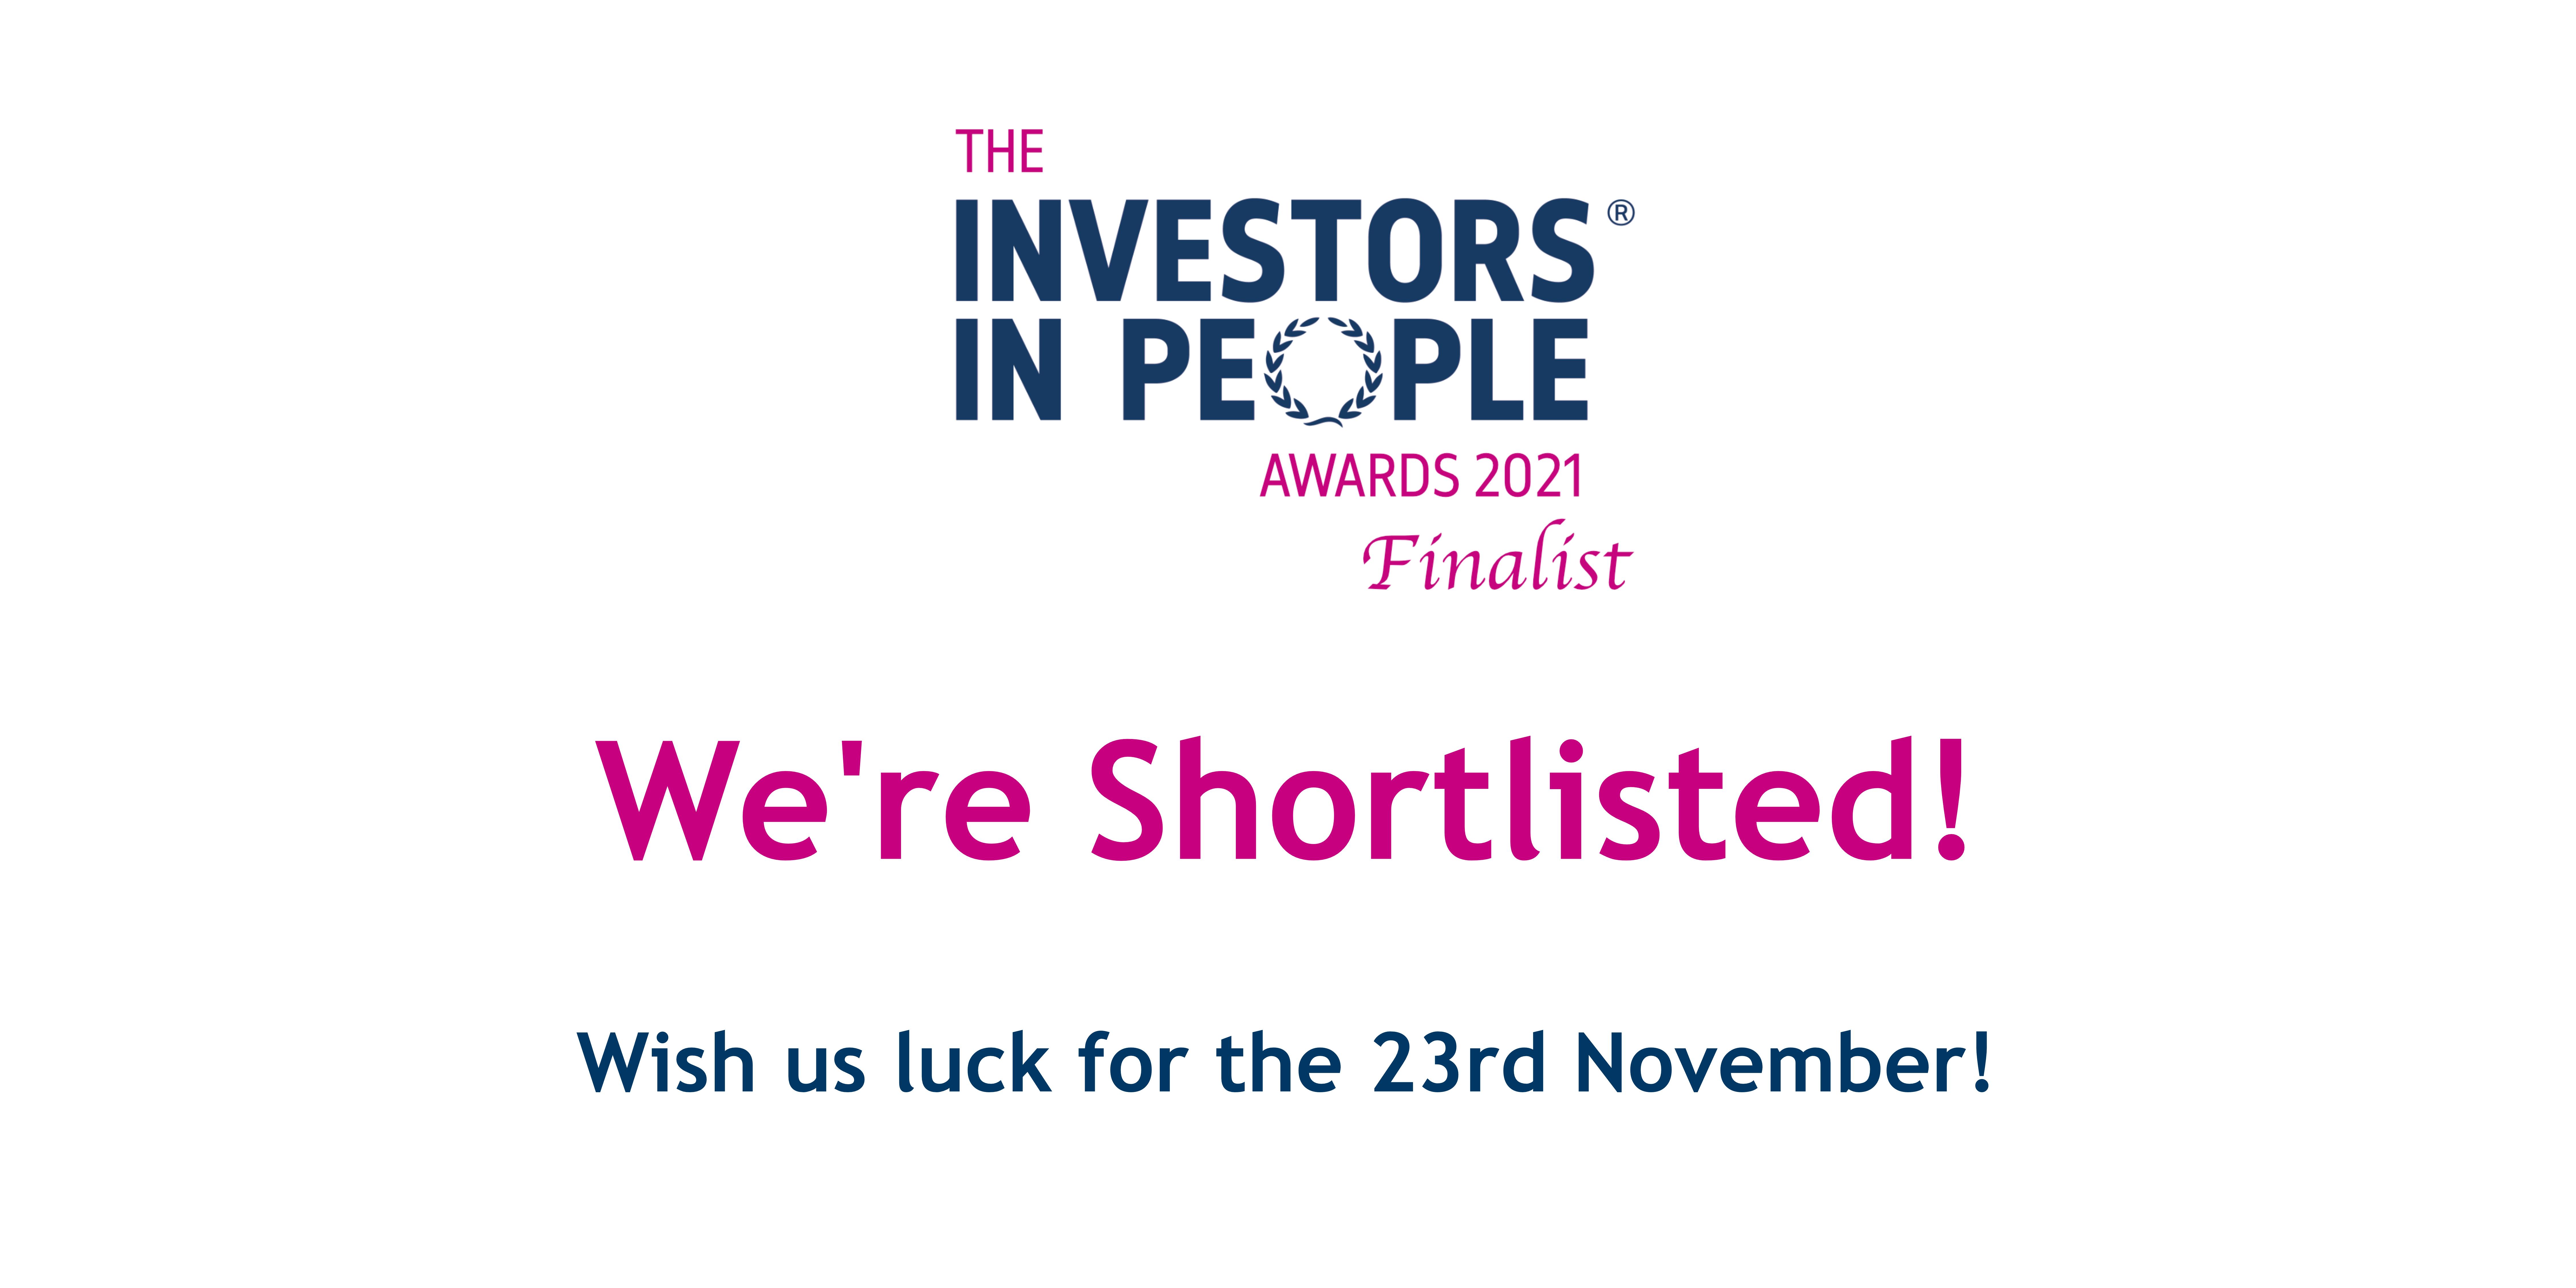 Investors in People shortlisted logo